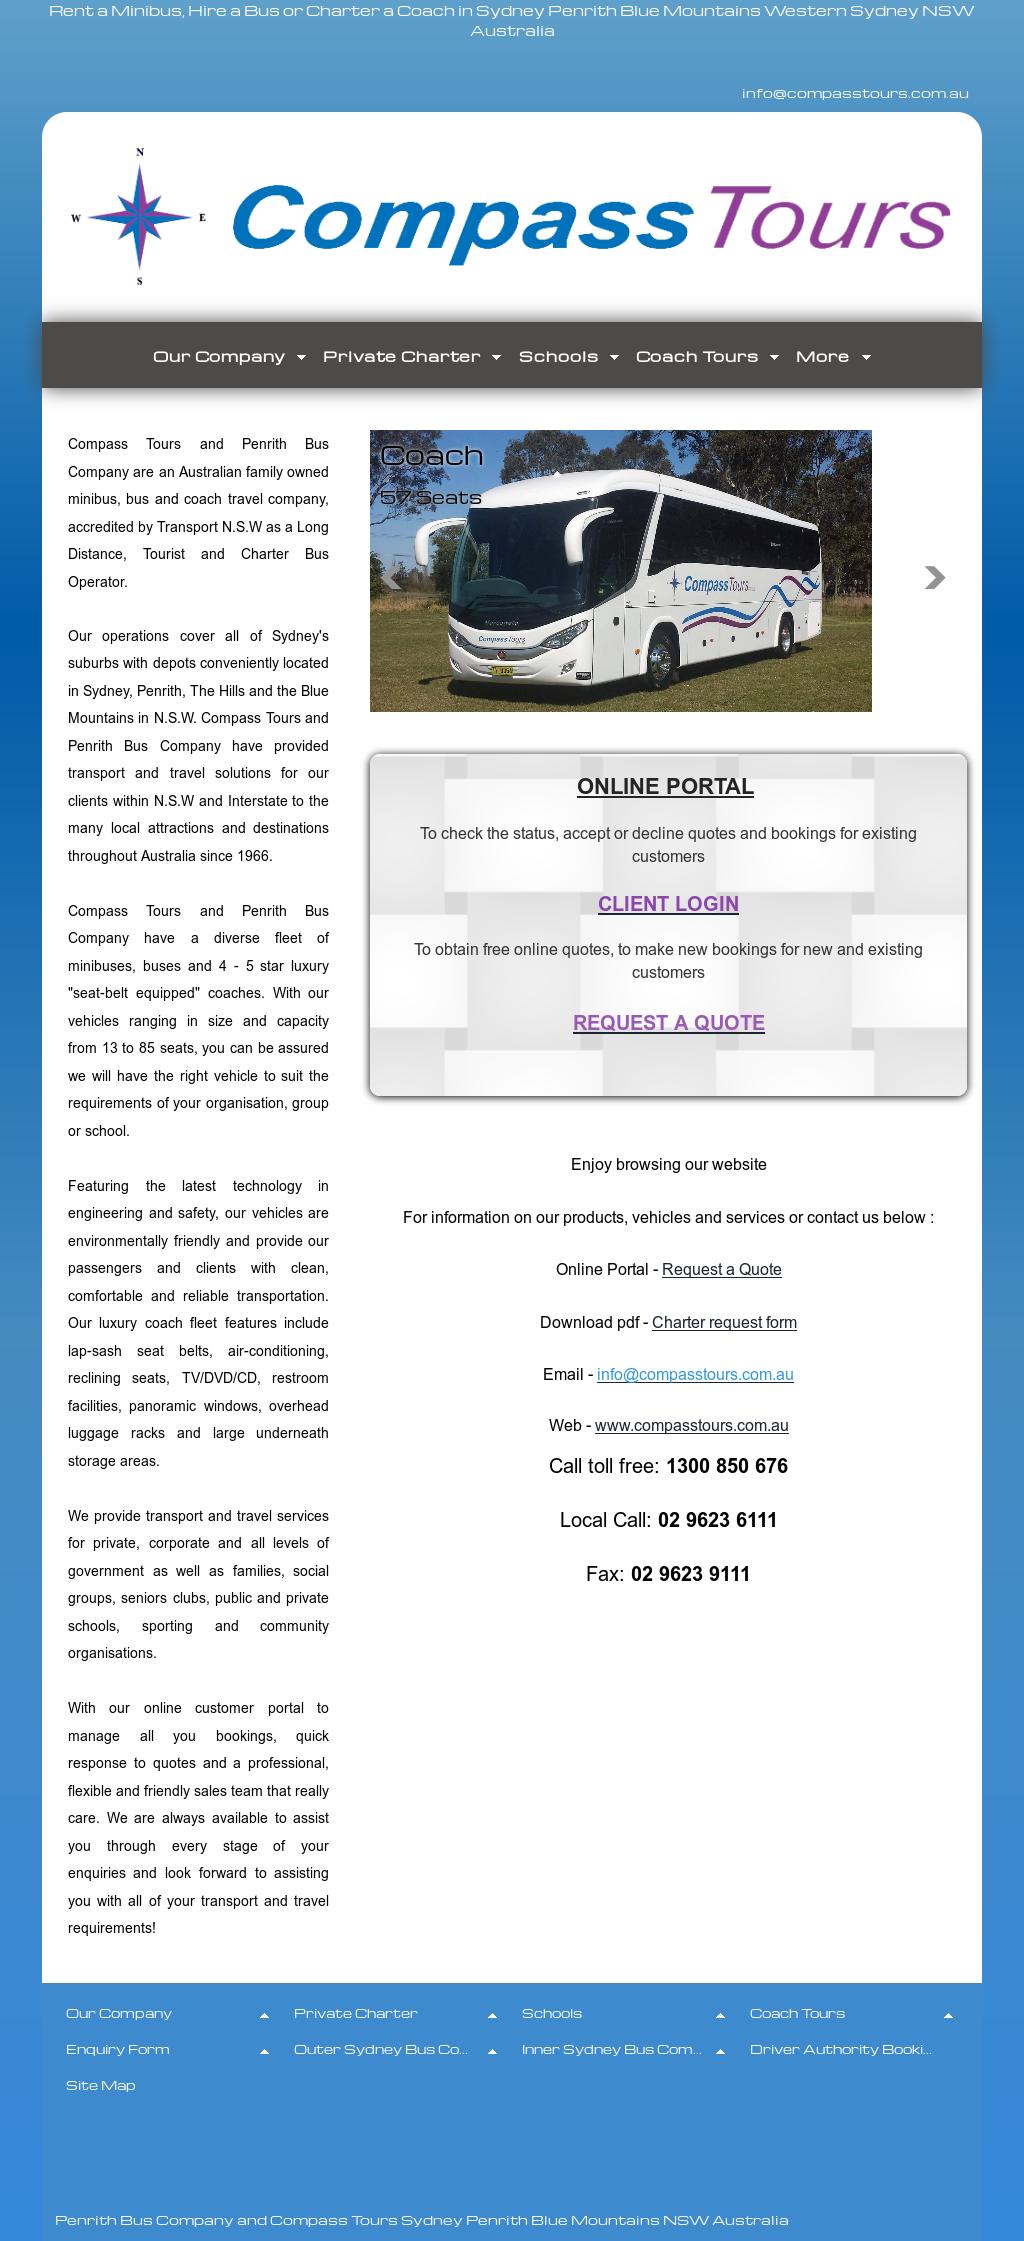 Compass Tours And Penrith Bus Company Competitors, Revenue